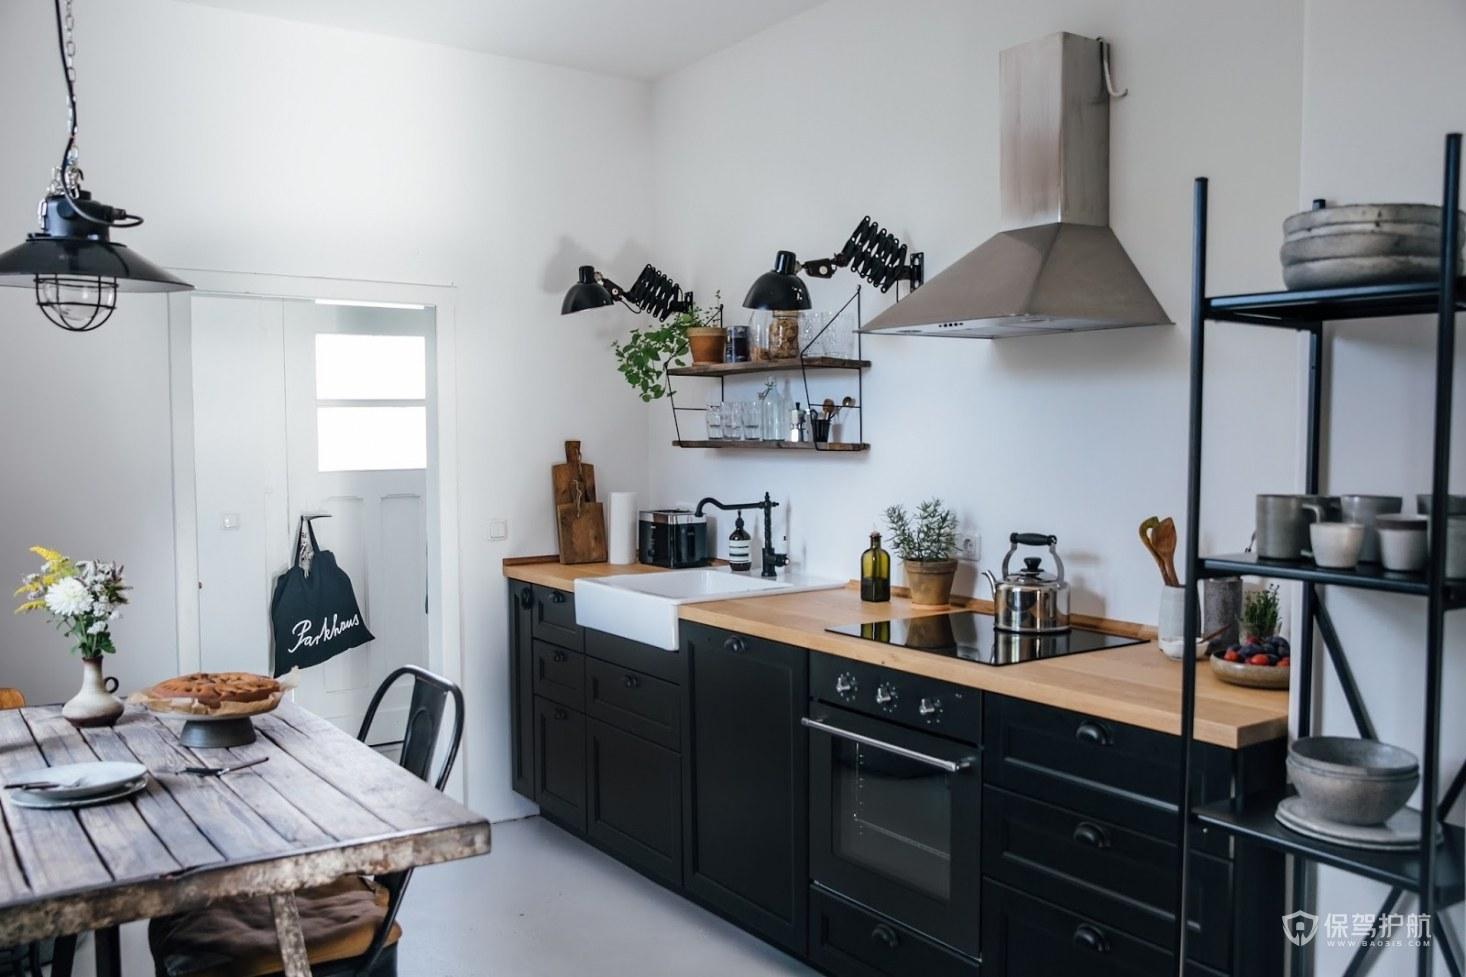 two tone kitchen table remodel hawaii 乡村大改造 将小破房完美改造成宜家创意厨房 的整体 先来一张全景图 改造后的厨房整体